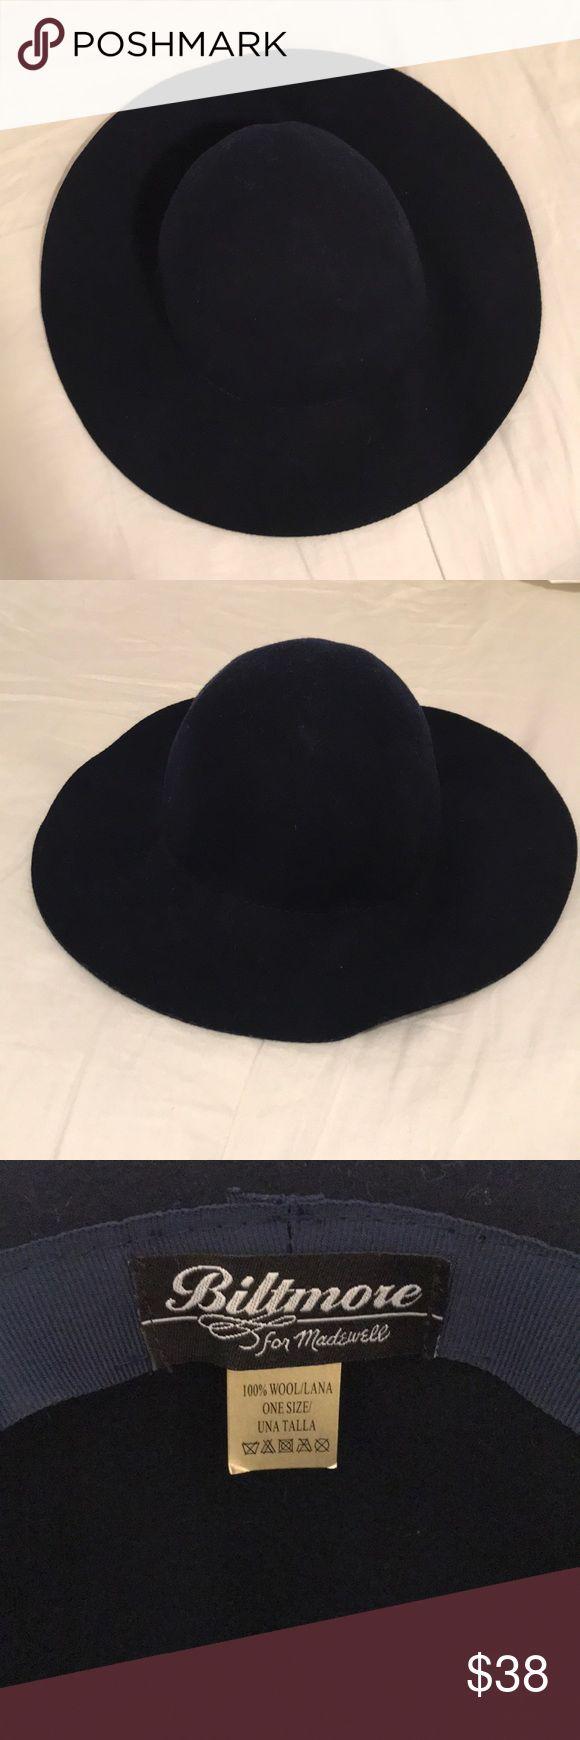 "Madewell x Biltmore hat Navy floppy brim hat, Biltmore for Madewell. Brim: 3"" Circumference: 23"" Madewell Accessories Hats"